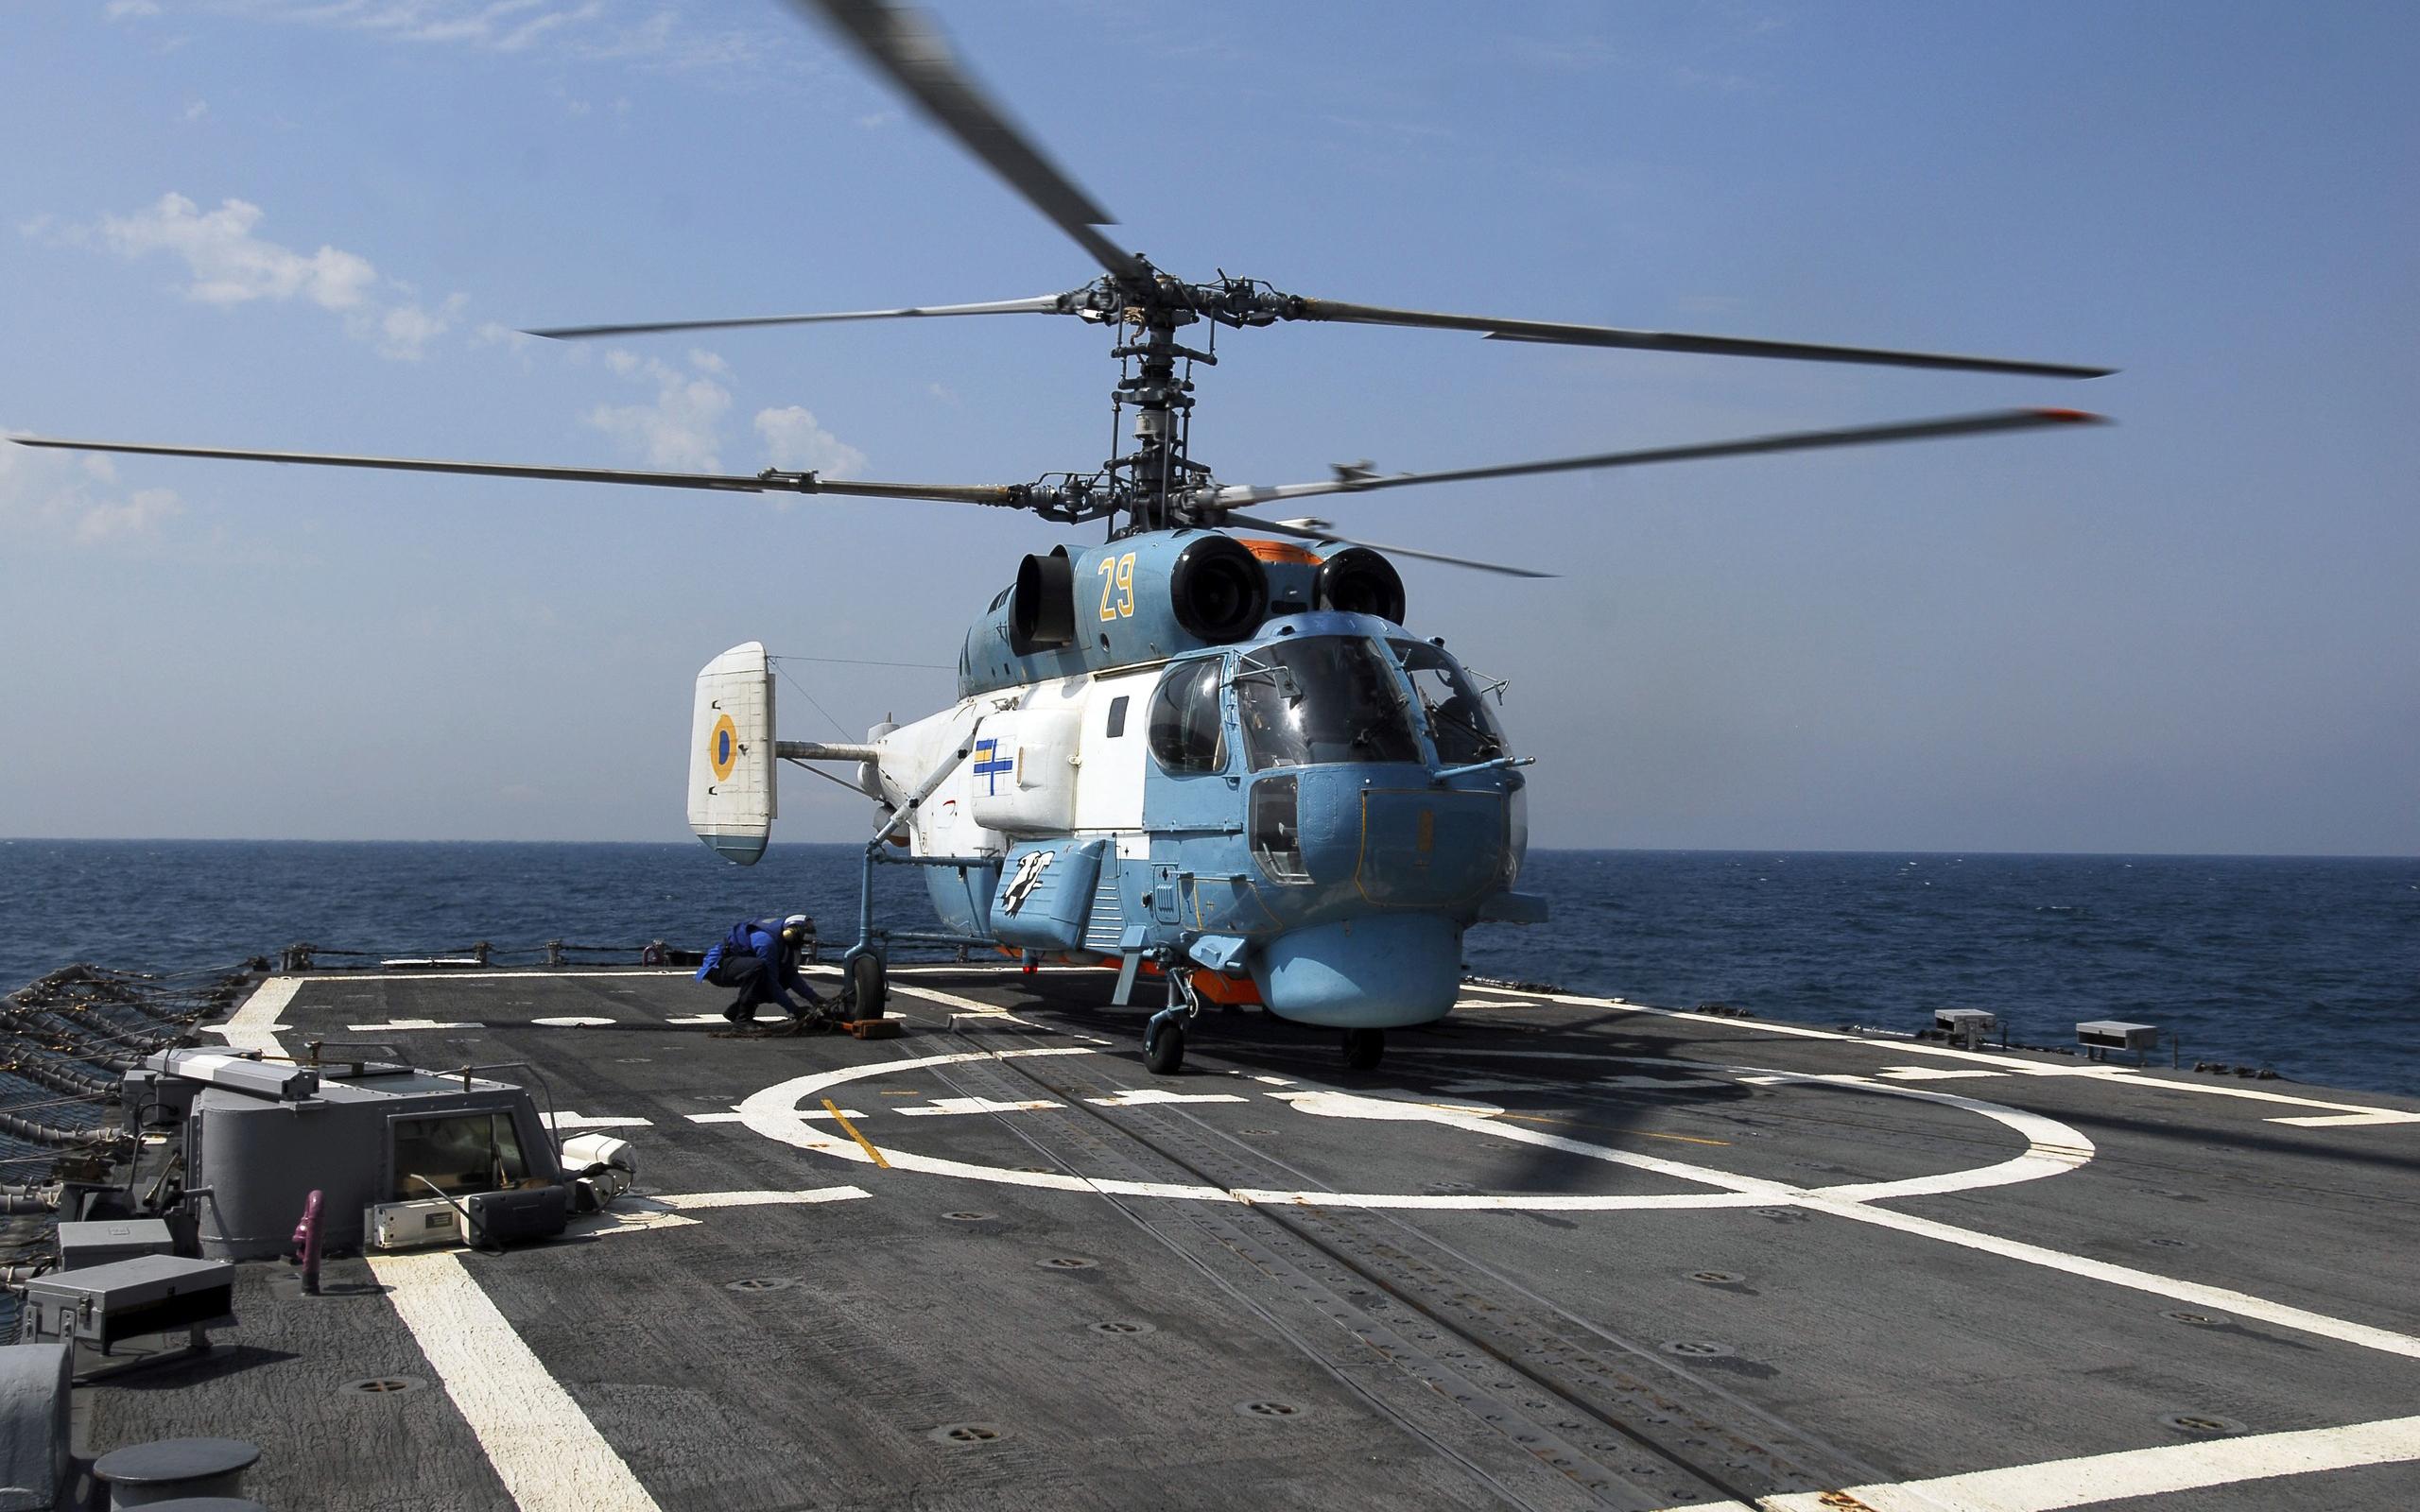 вертолет, лопасти, океан